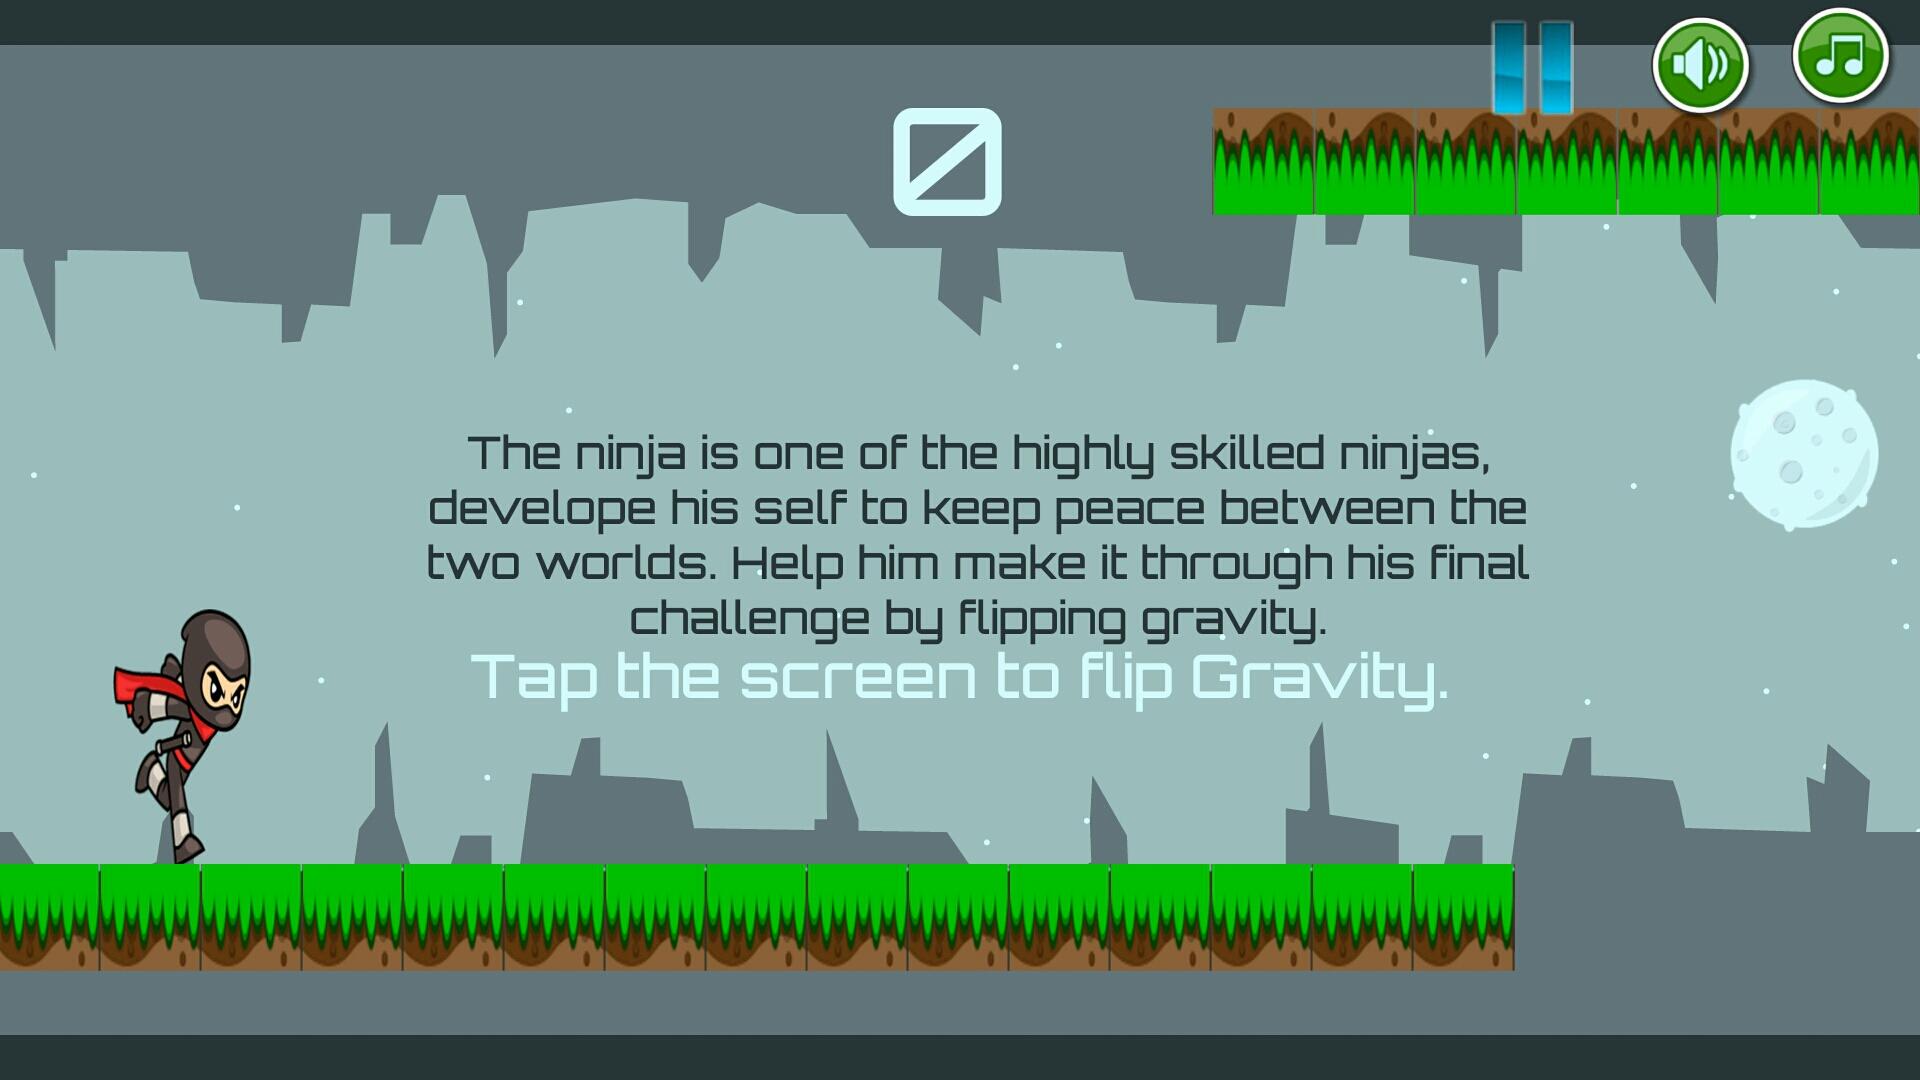 Amazon.com: Ninja Gravity Flip: Appstore for Android